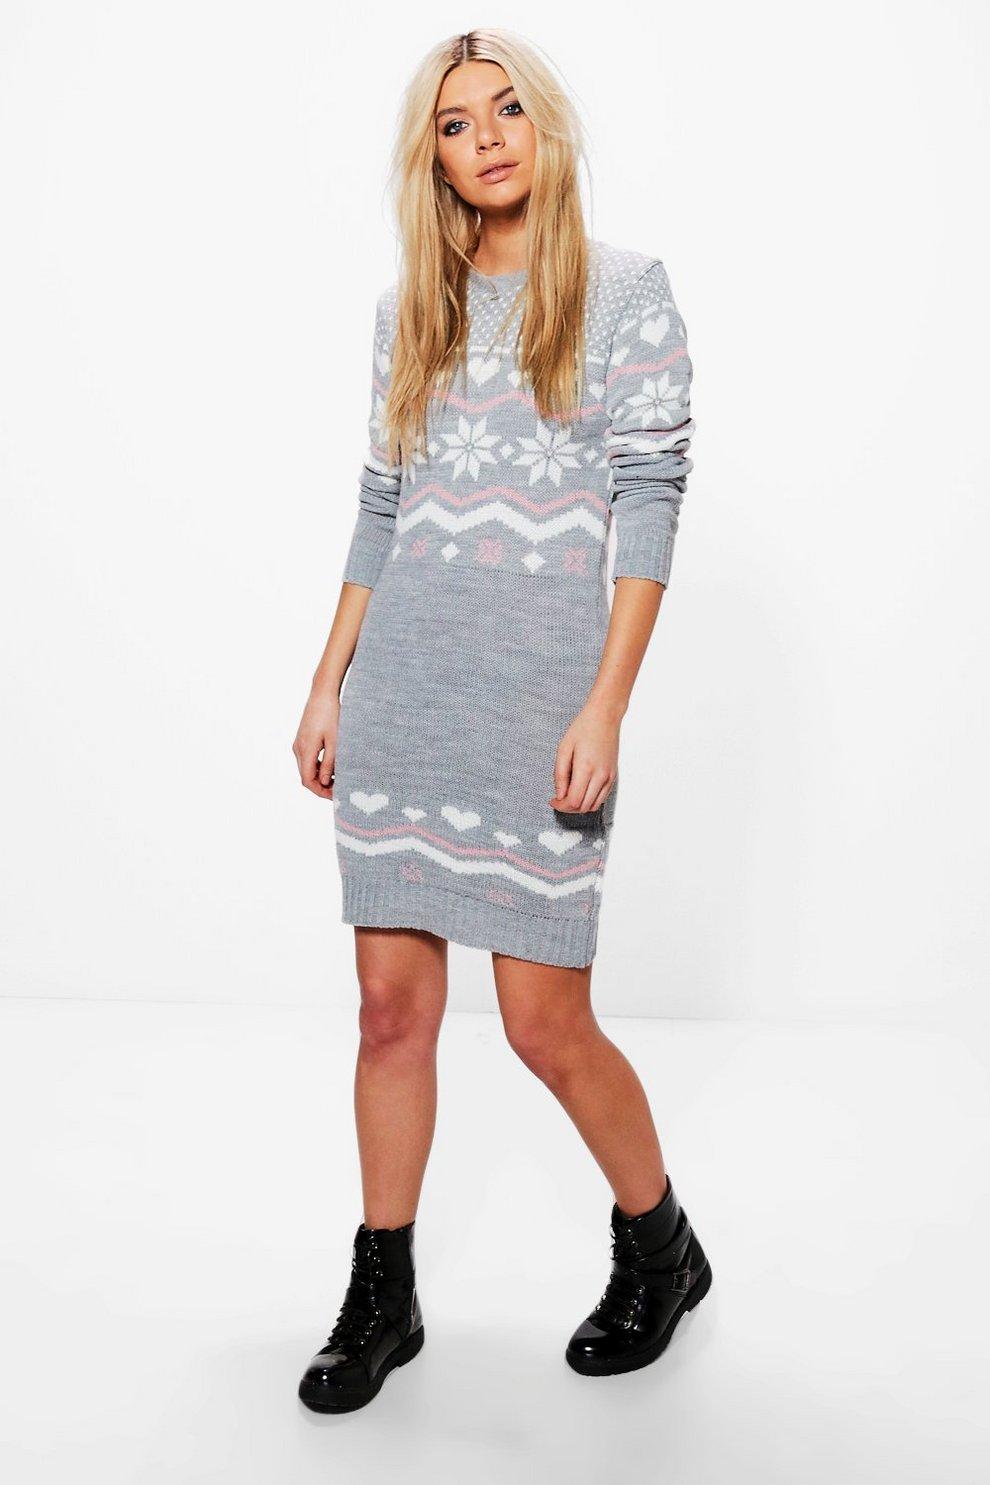 Freya Heart Fairisle Christmas Jumper Dress | Boohoo